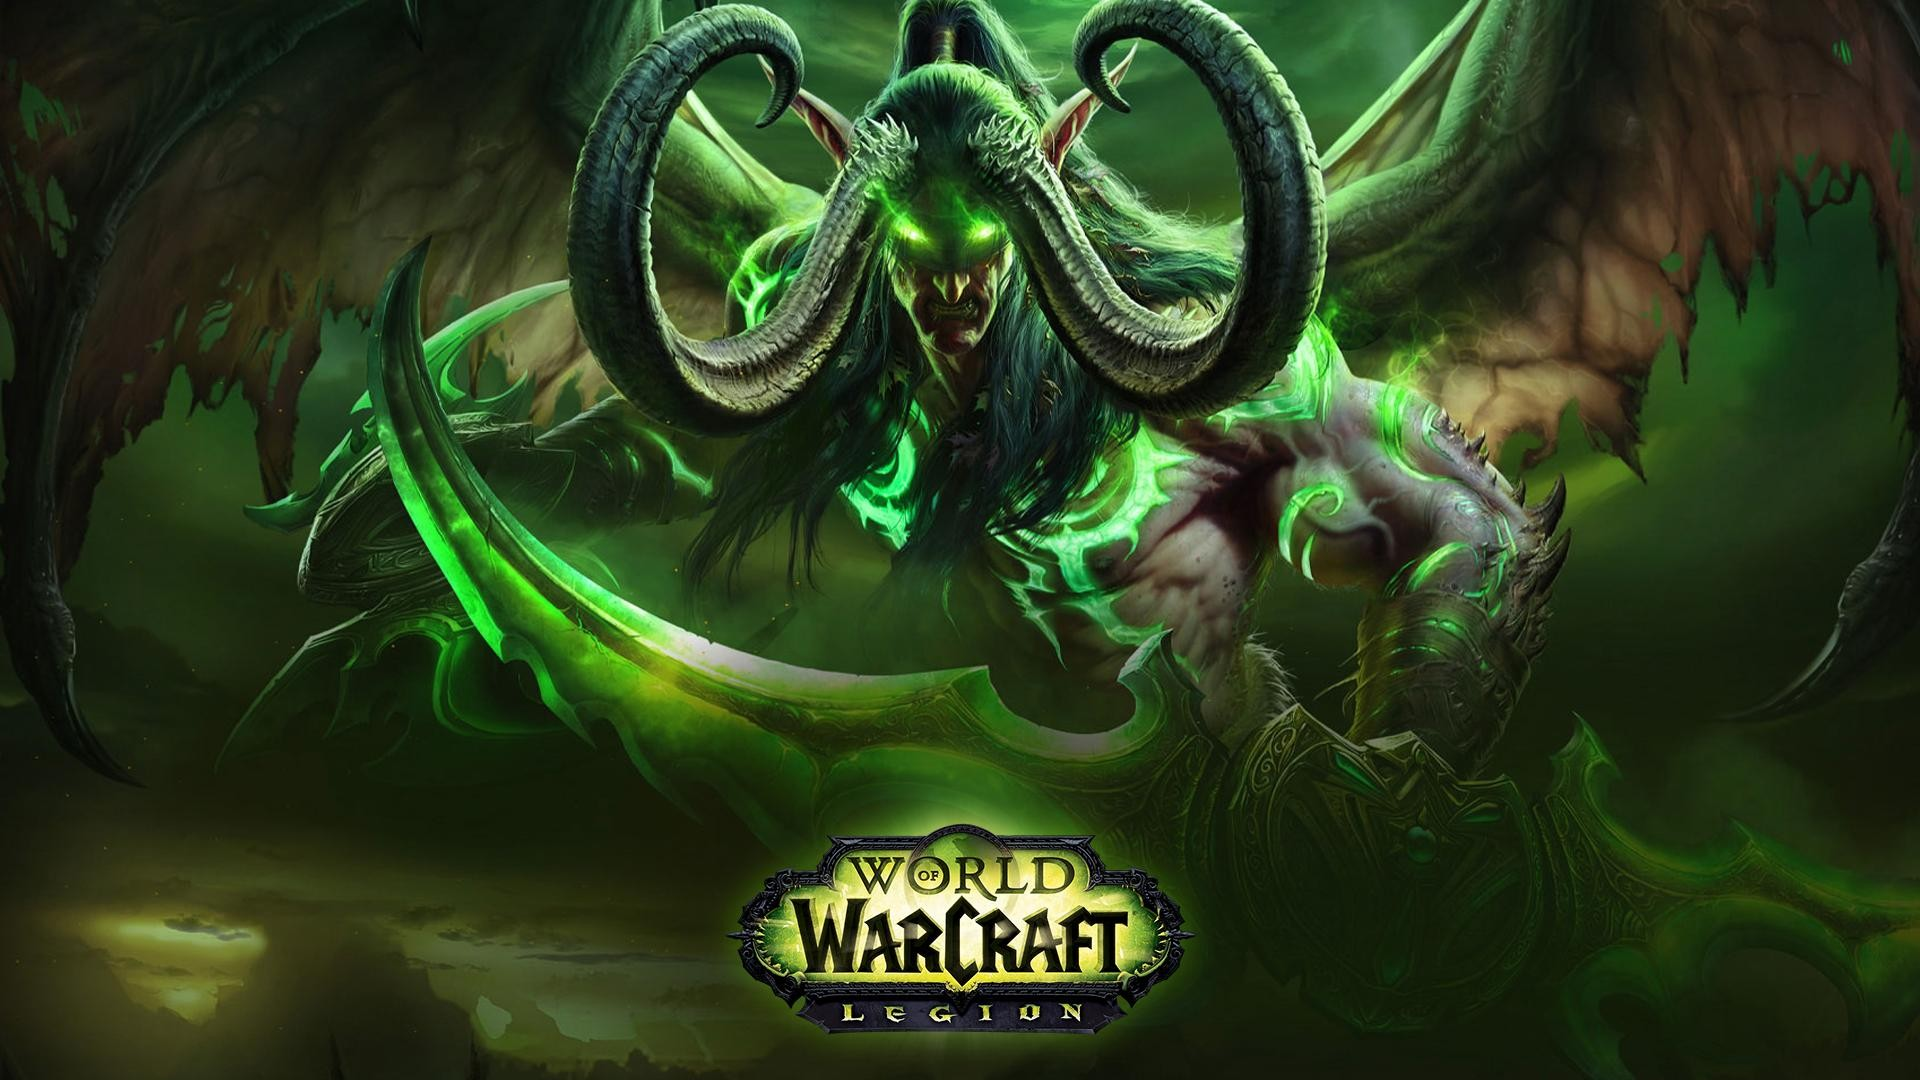 World of Warcraft Legion wallpaper ·① Download free ...